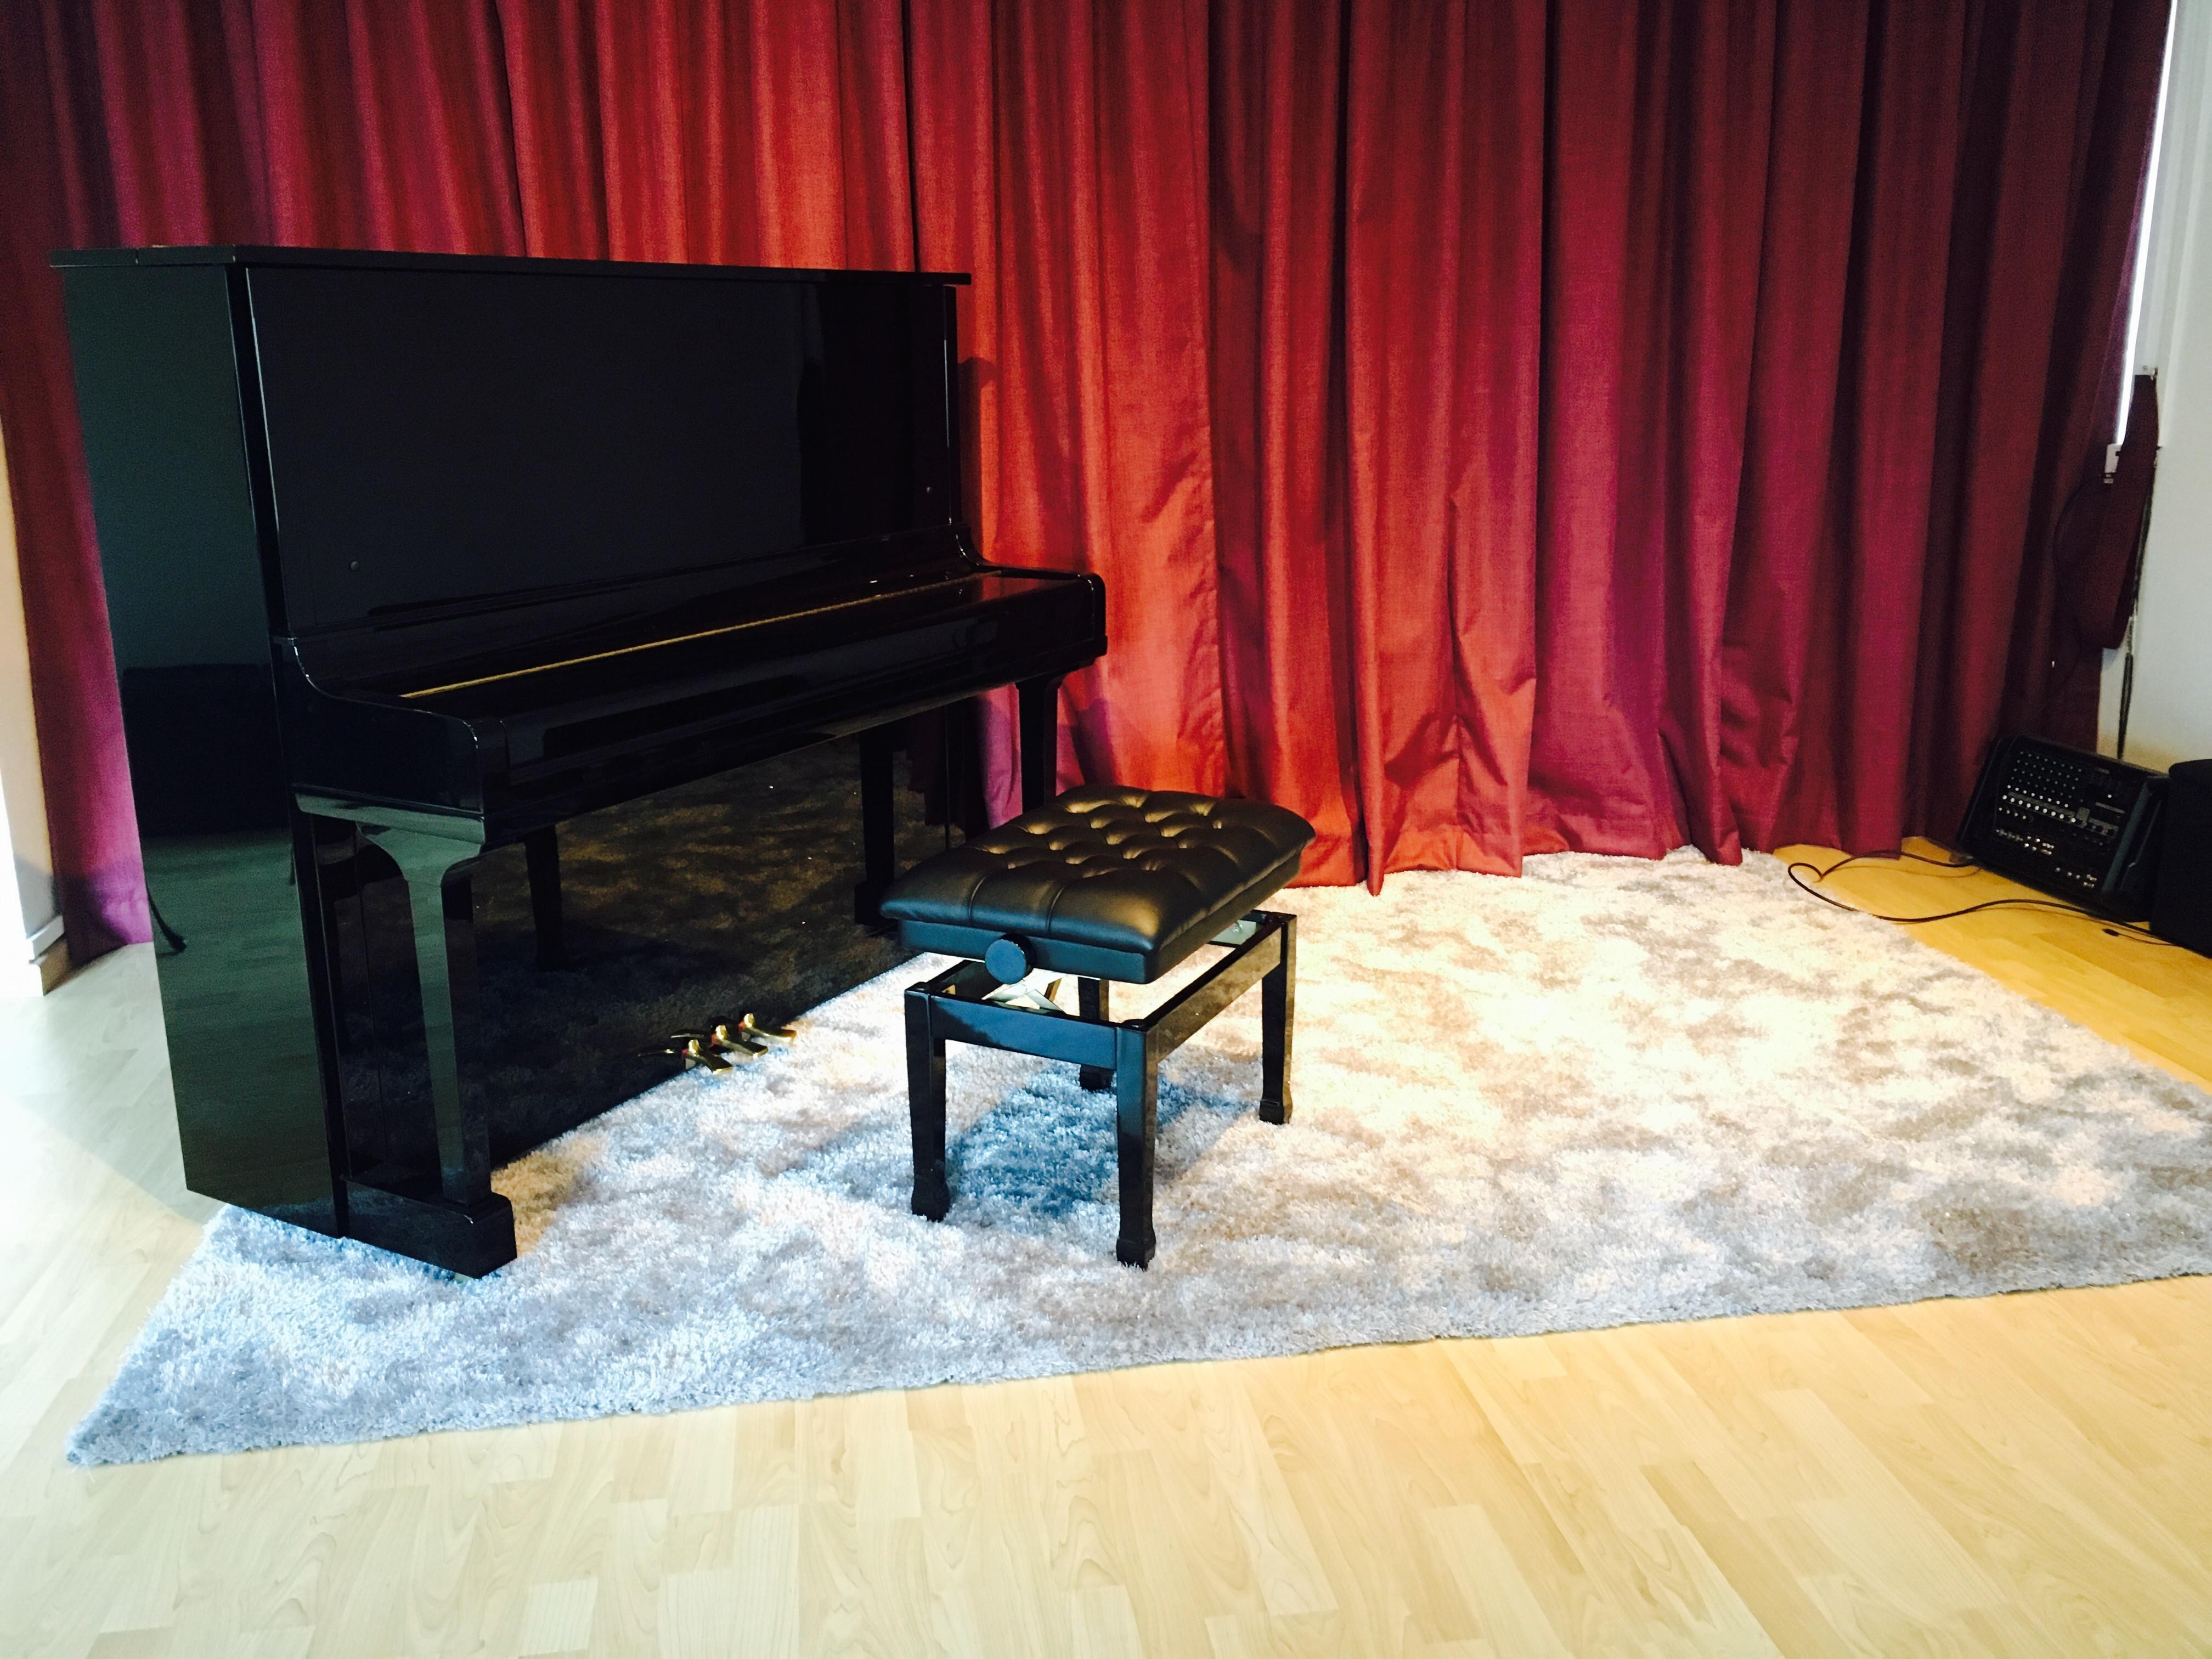 (EXAM STUDIO) Music Hall